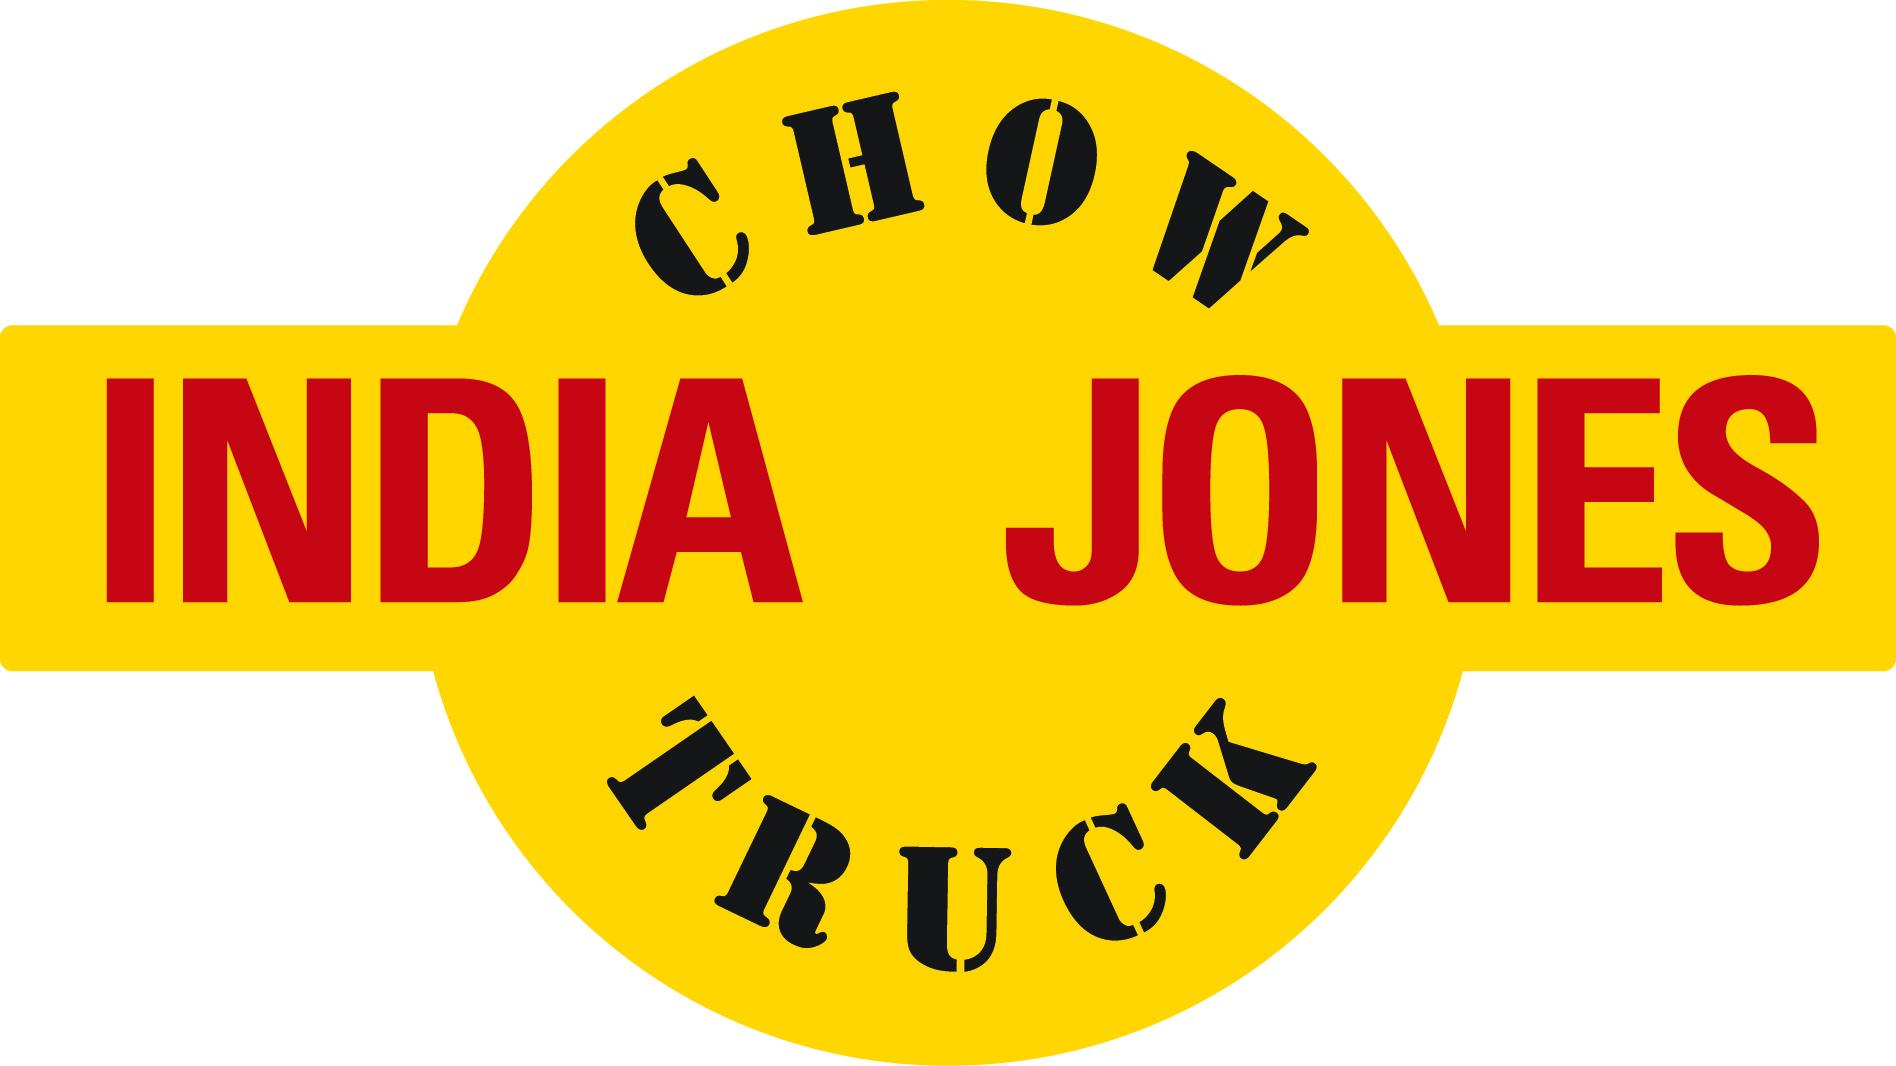 India Jones Chow Truck